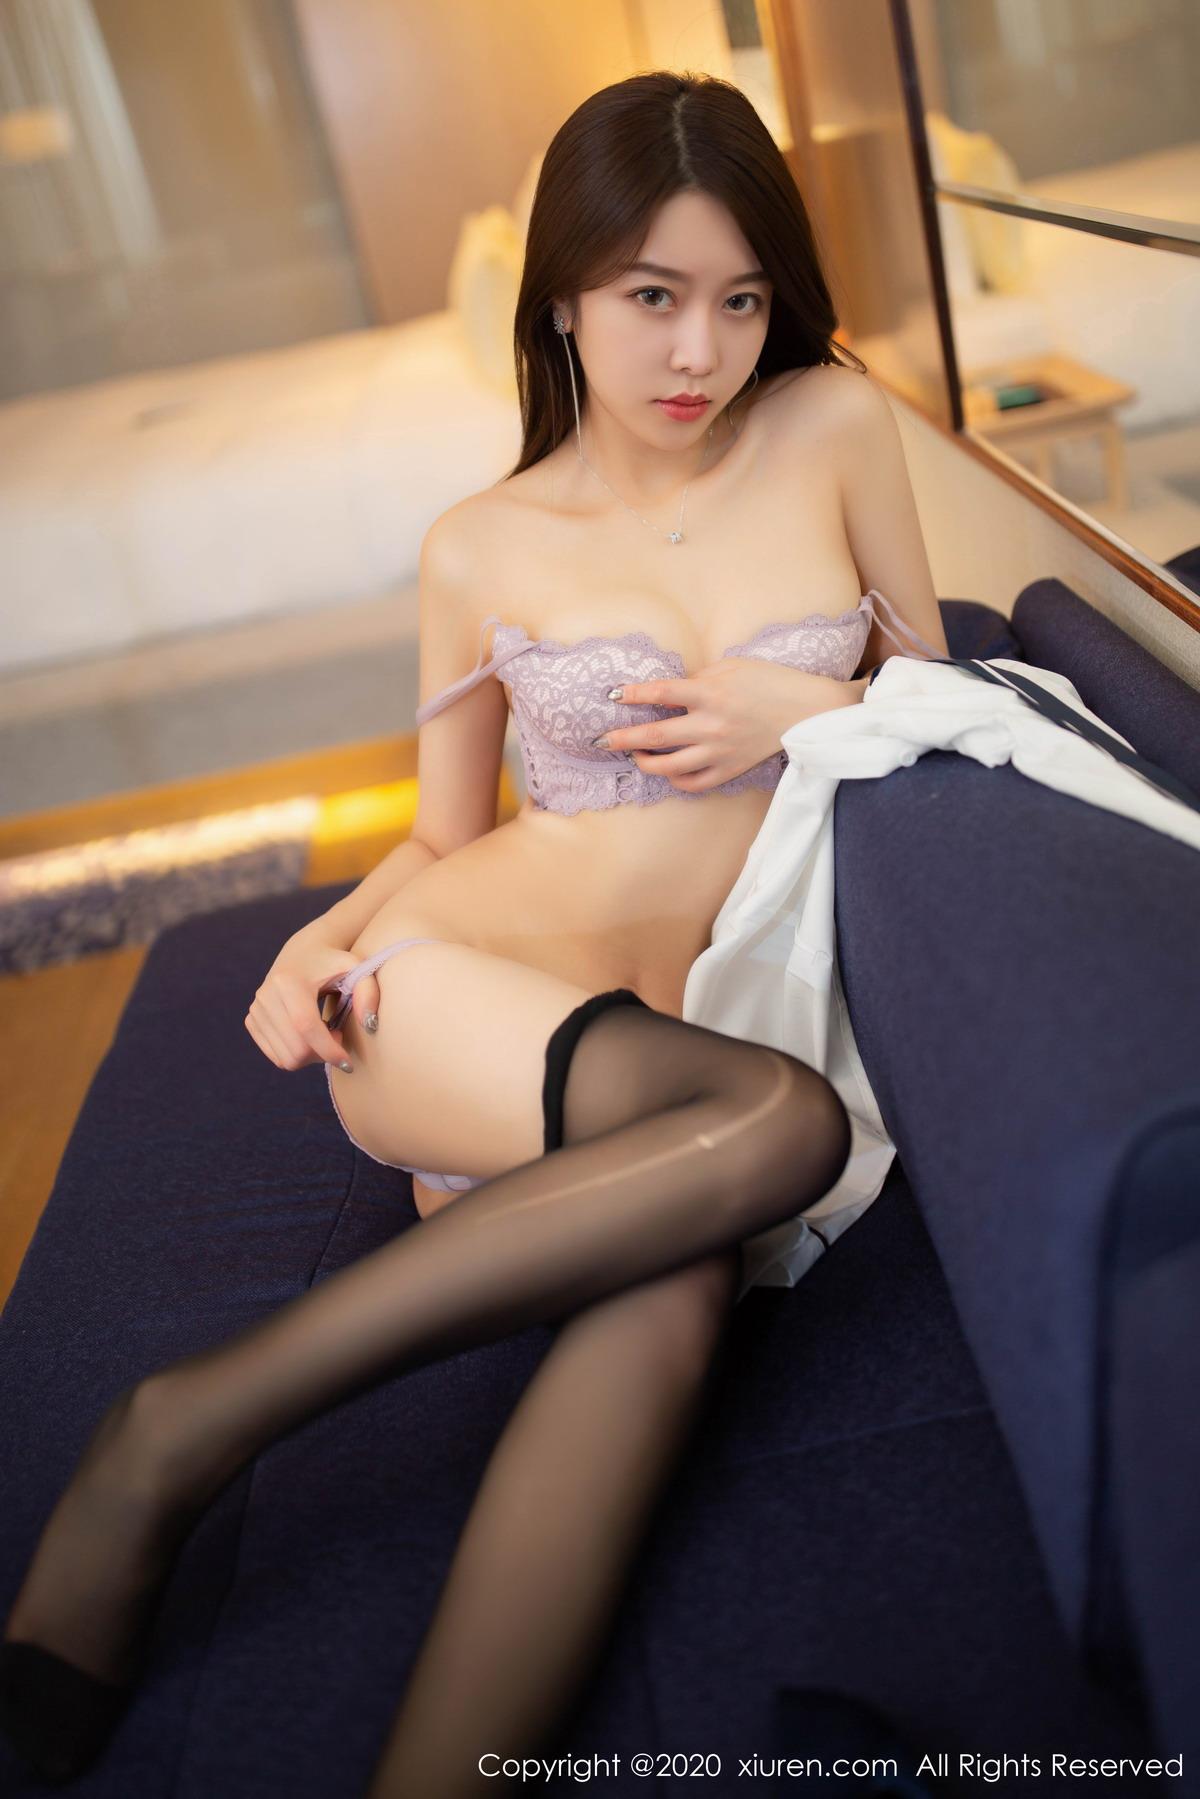 [XiuRen秀人网]2020.05.20 No.2267 夏诗雯Sally 黑丝 秘书[/162MB]